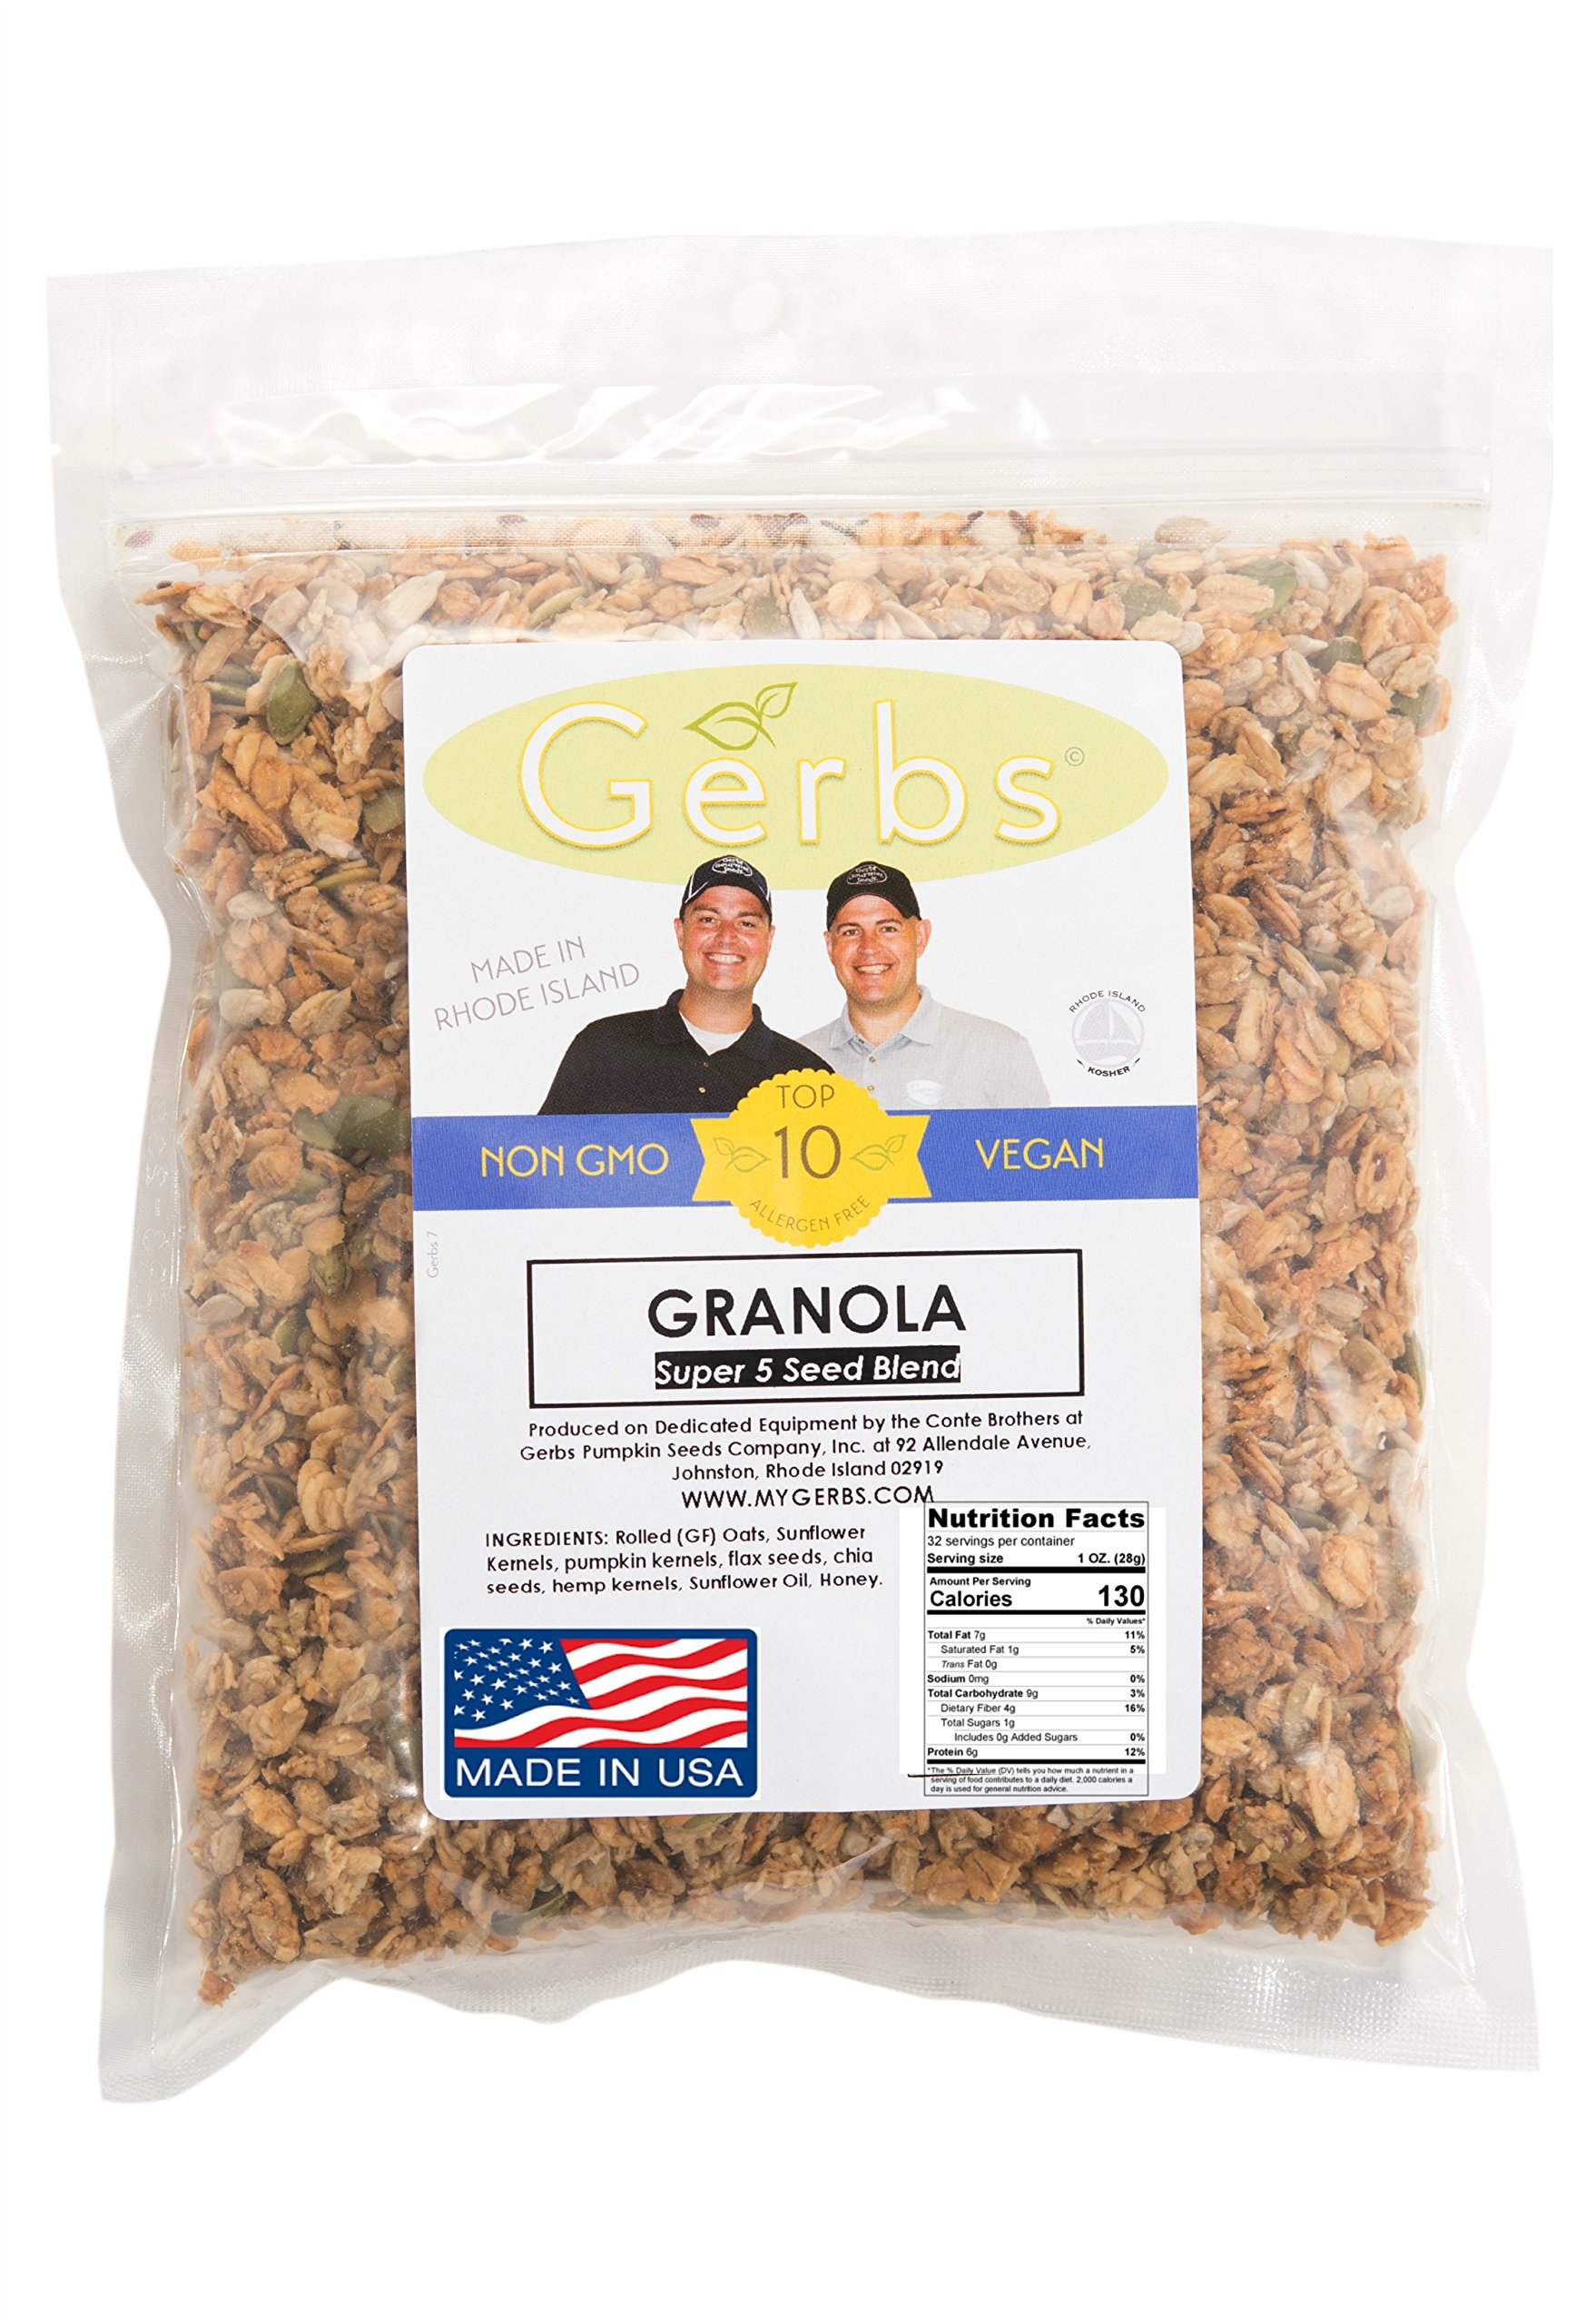 Super 5 Seed Granola (Pumpkin, Sunflower, Chia, Hemp, Flax) – 2 LBS - Top 11 Food Allergen Free & NON GMO – Vegan & Kosher